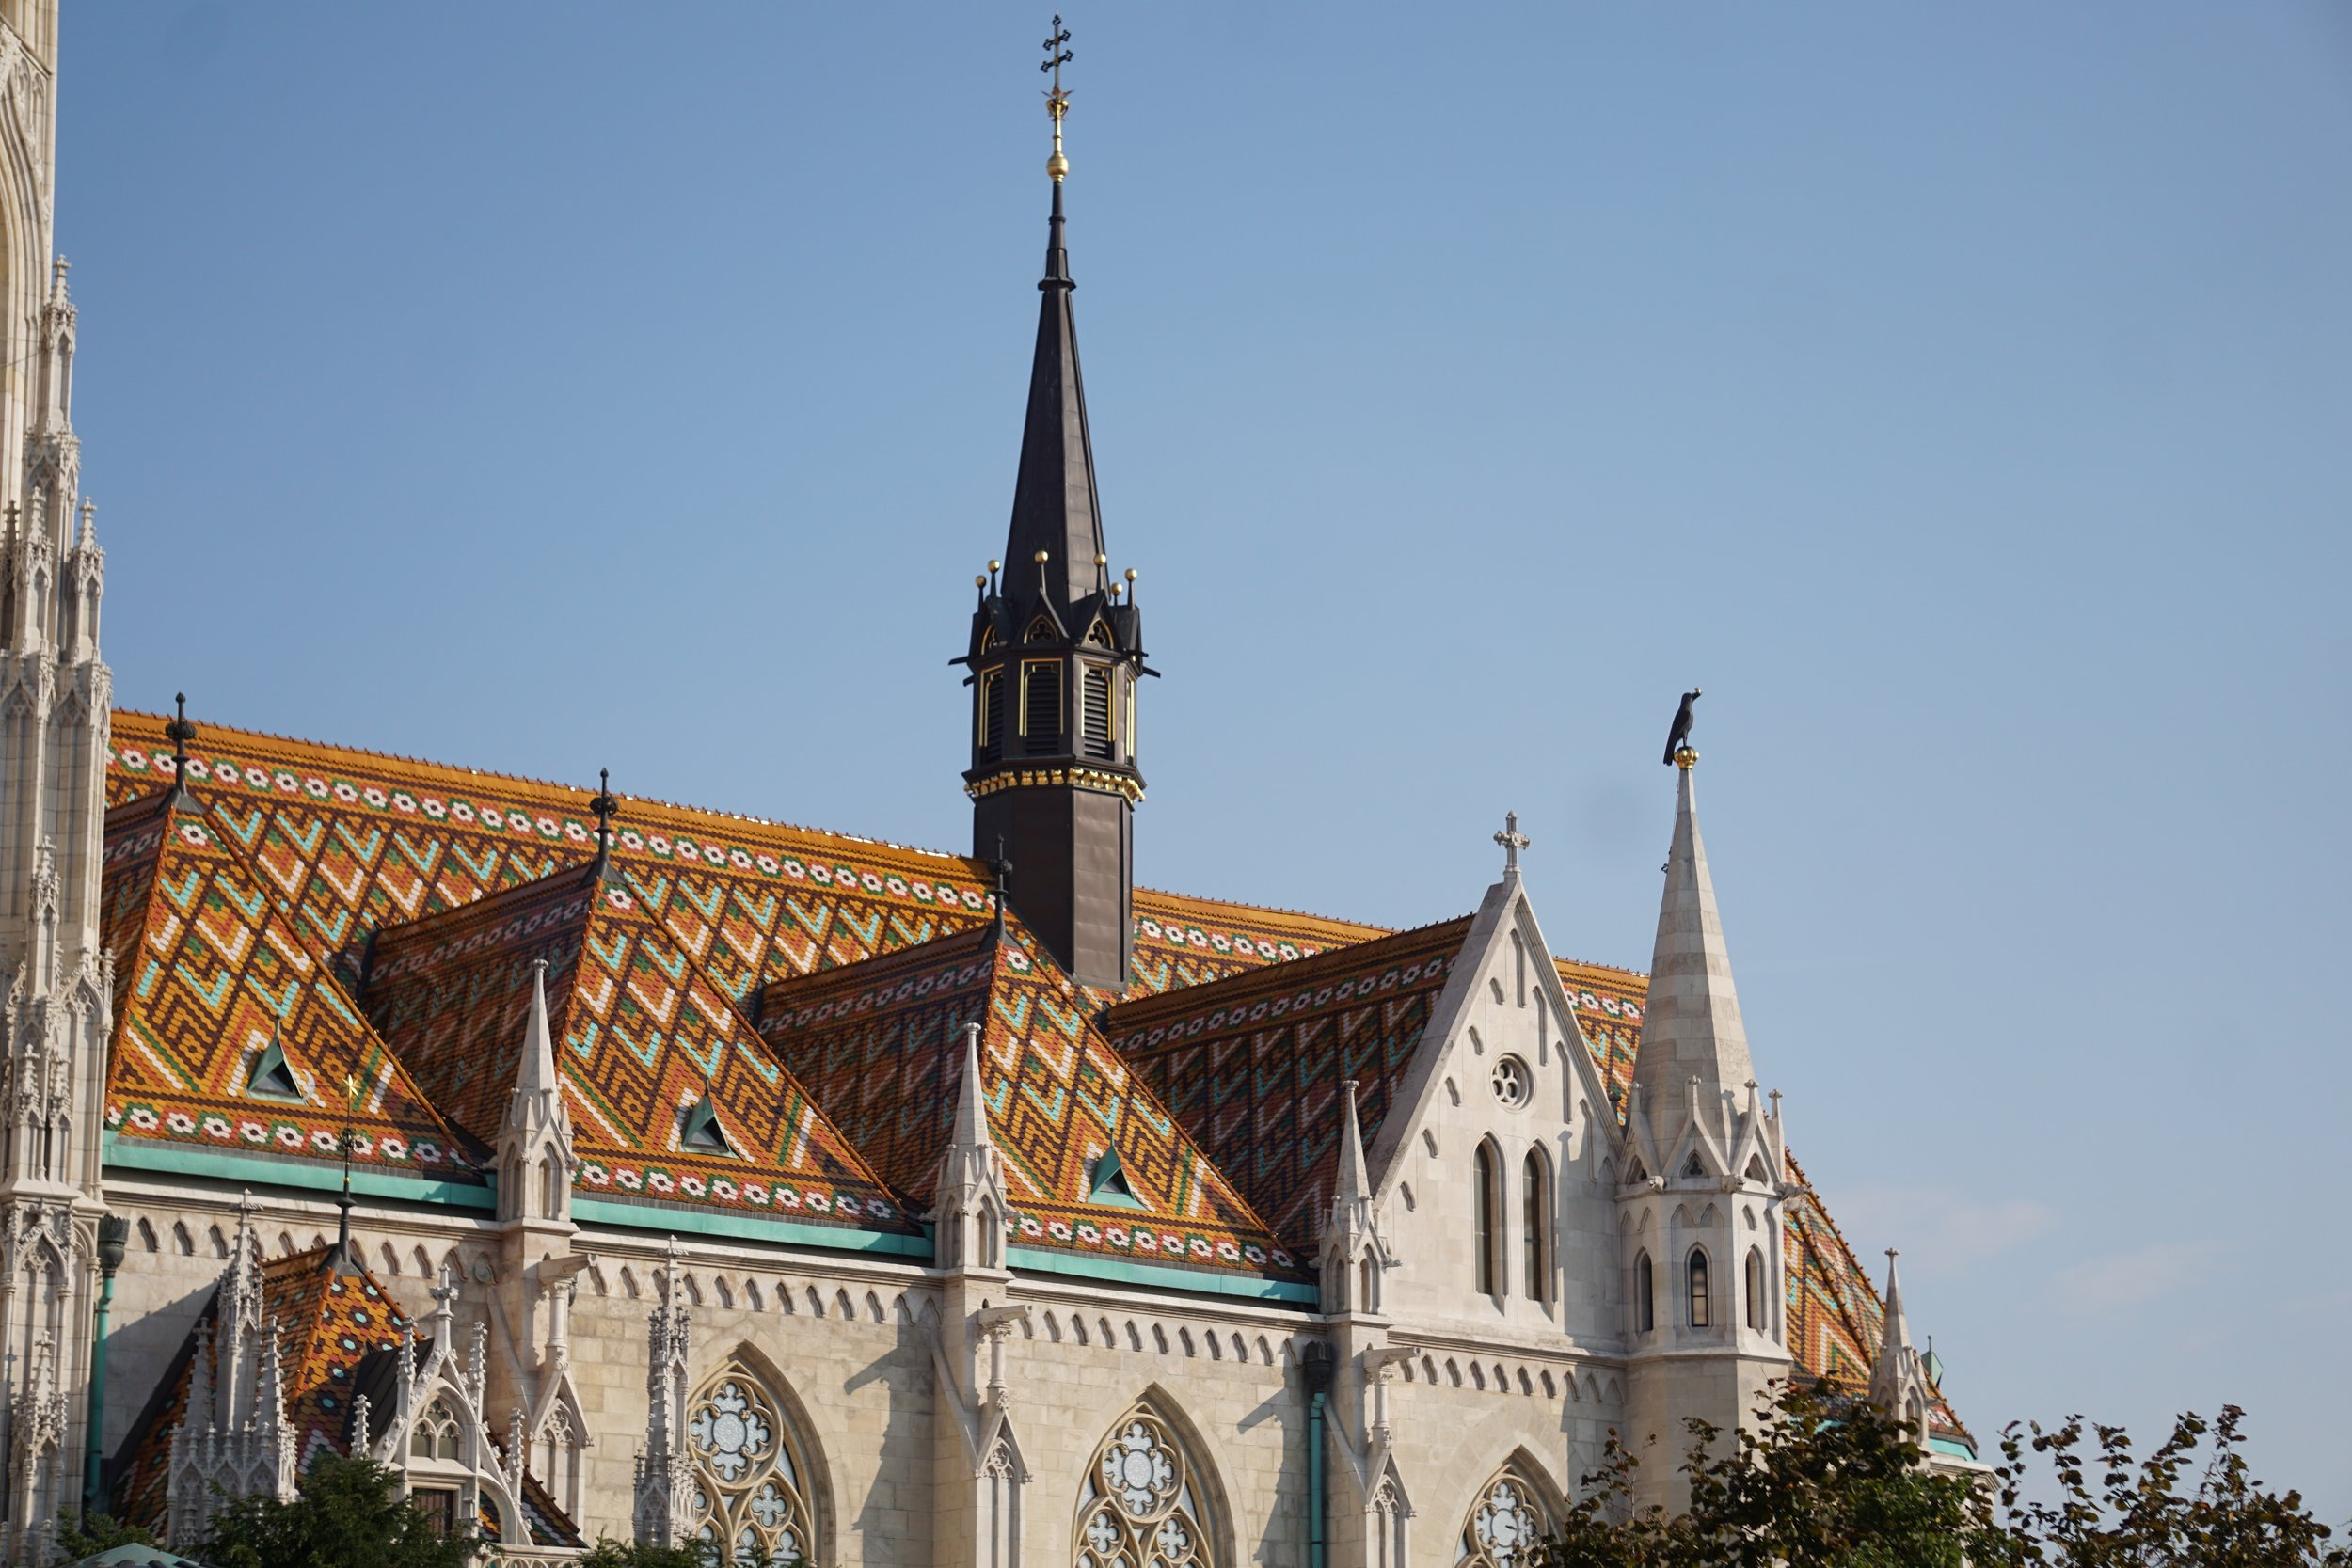 Extraordinary church roof